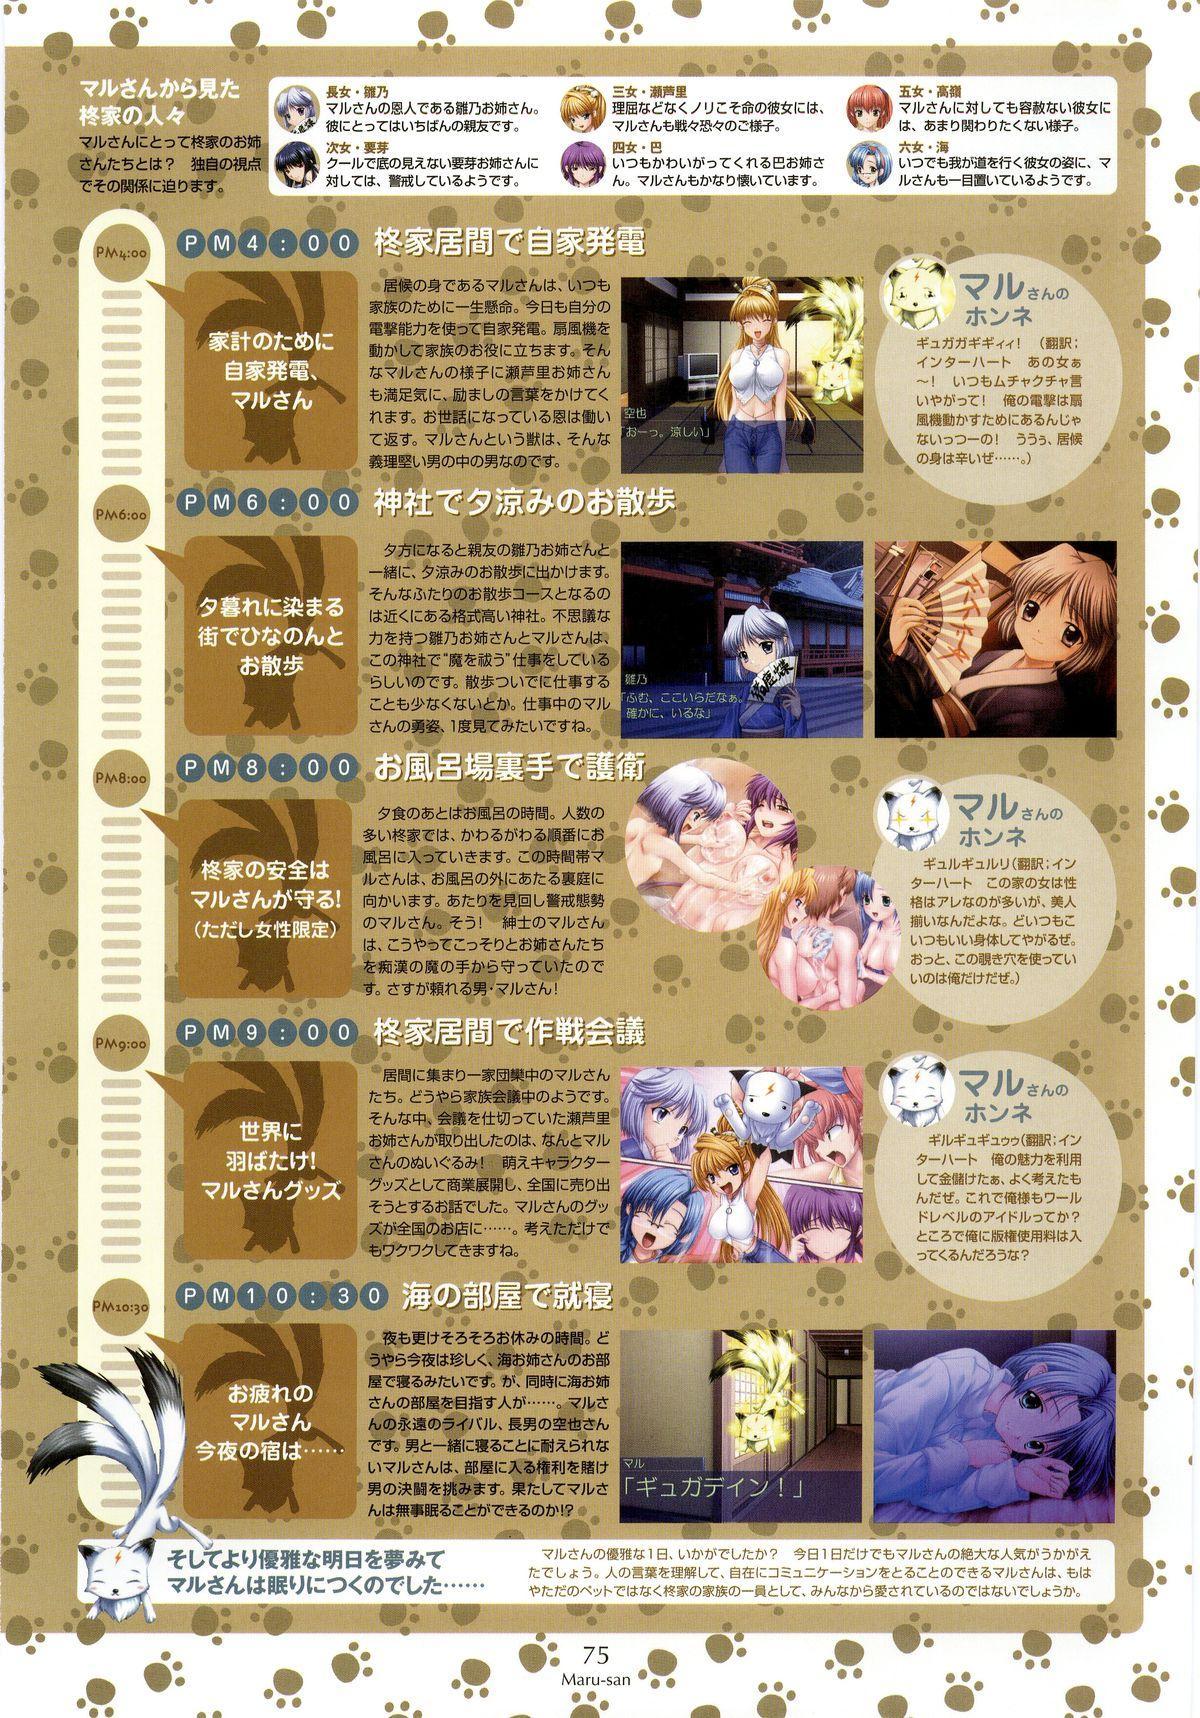 Nee, Chan to Shiyou yo! Koushiki Fanbook - Ai to Batou no Hibi 66